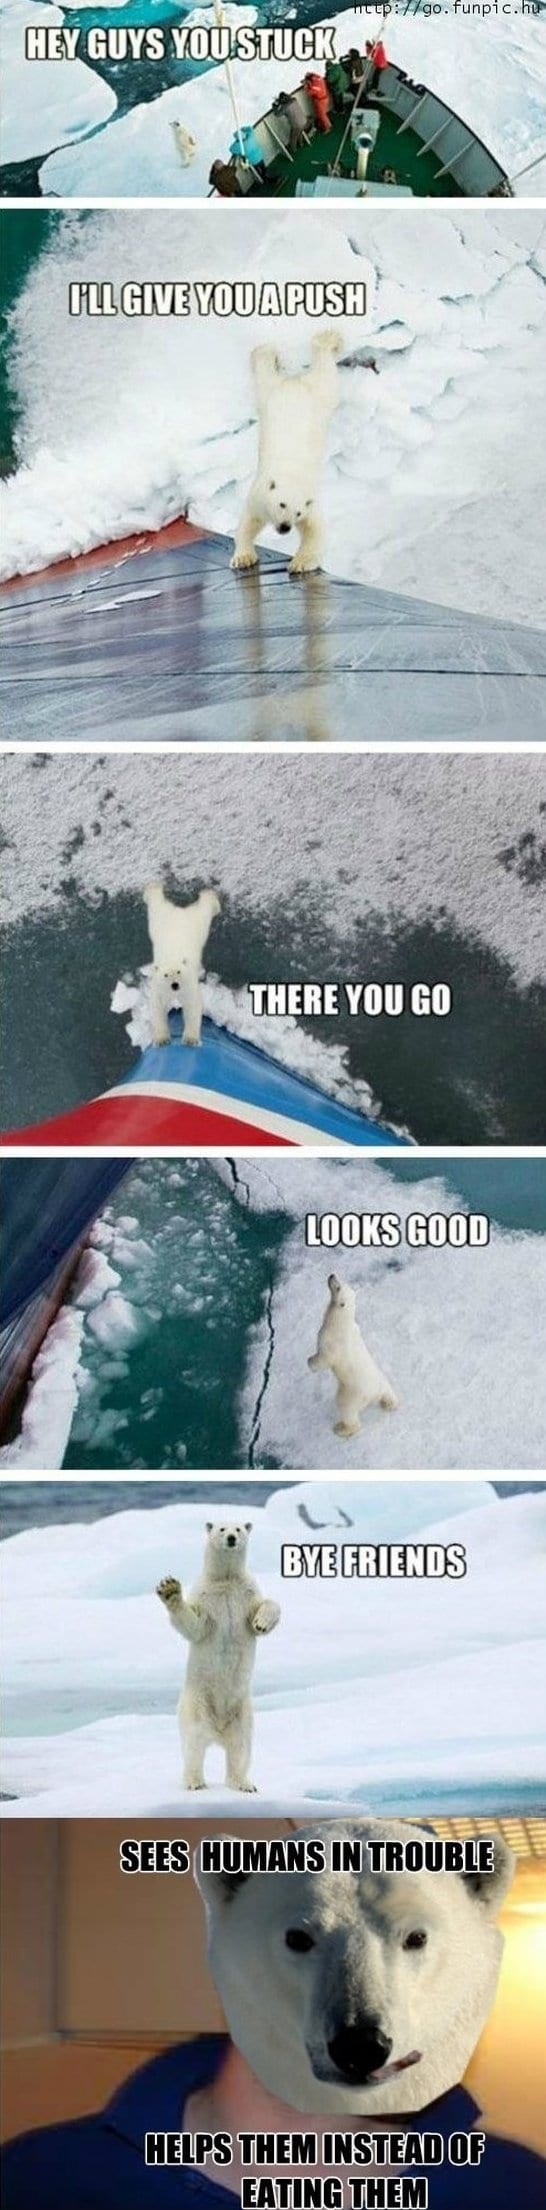 funny-polar-bear-funny-pictures-meme-jokes